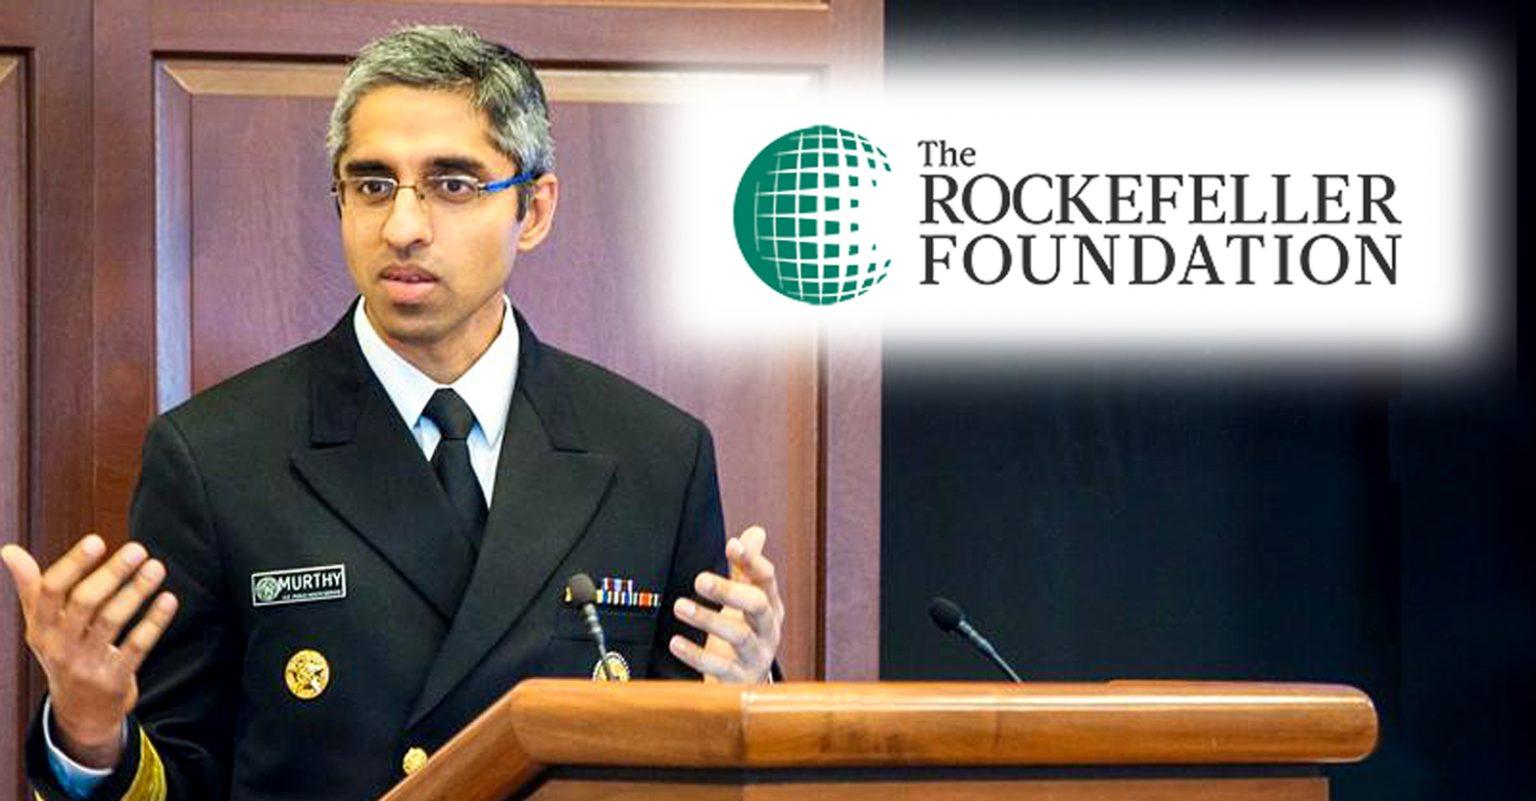 U.S. Surgeon General, Rockefeller Foundation Announce Big Initiatives to Address 'Urgent Threat' of Vaccine Misinformation